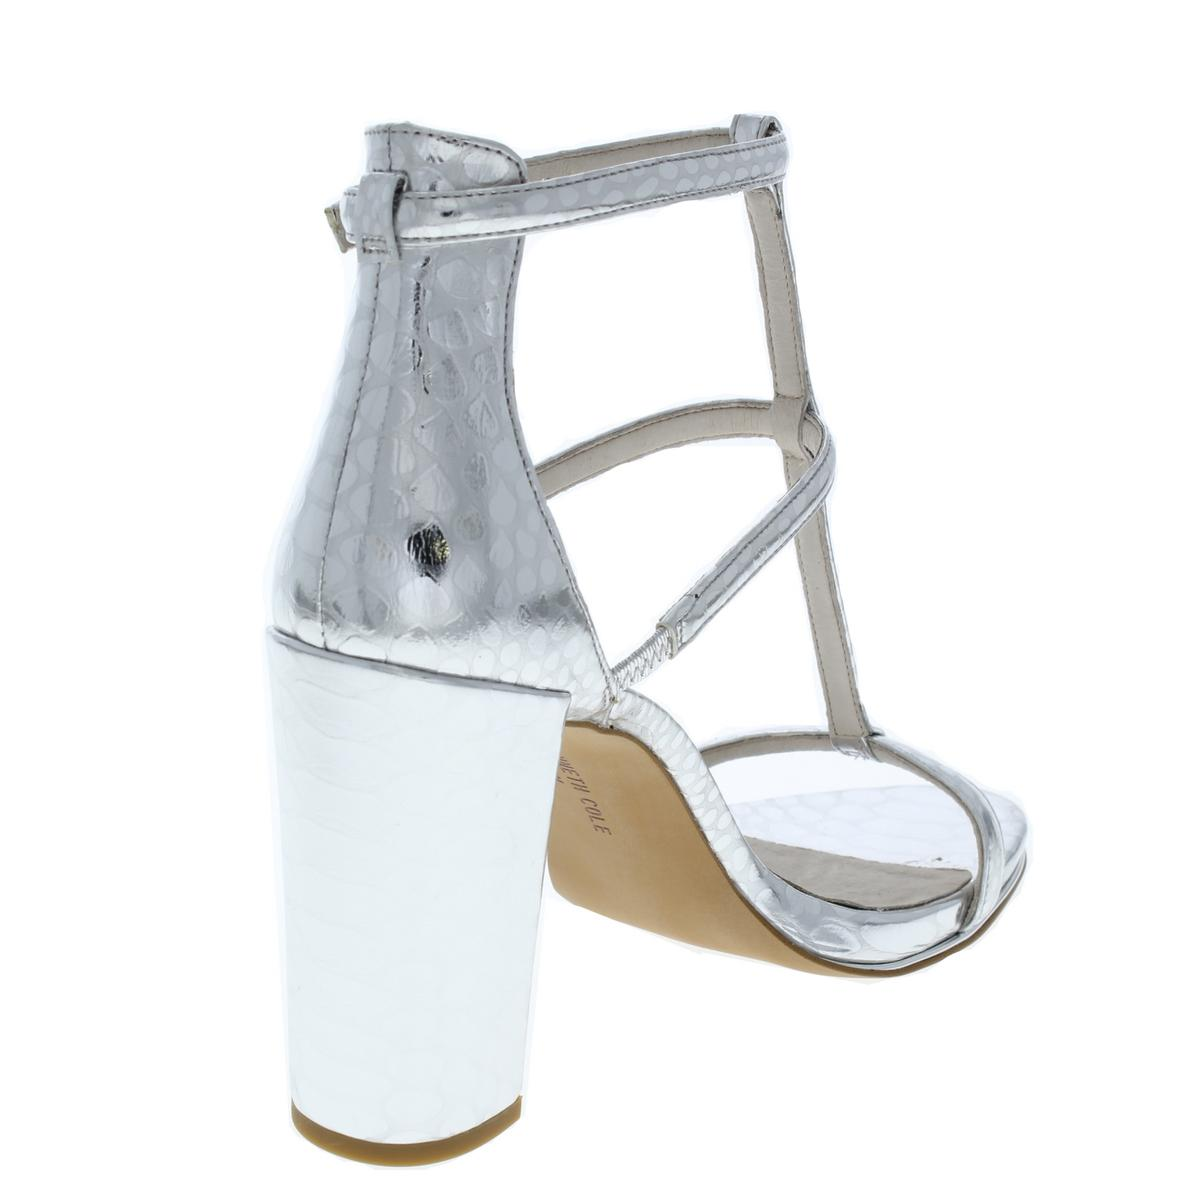 Kenneth-Cole-New-York-Womens-Deandra-Pattern-Dress-Sandals-Shoes-BHFO-5019 thumbnail 6